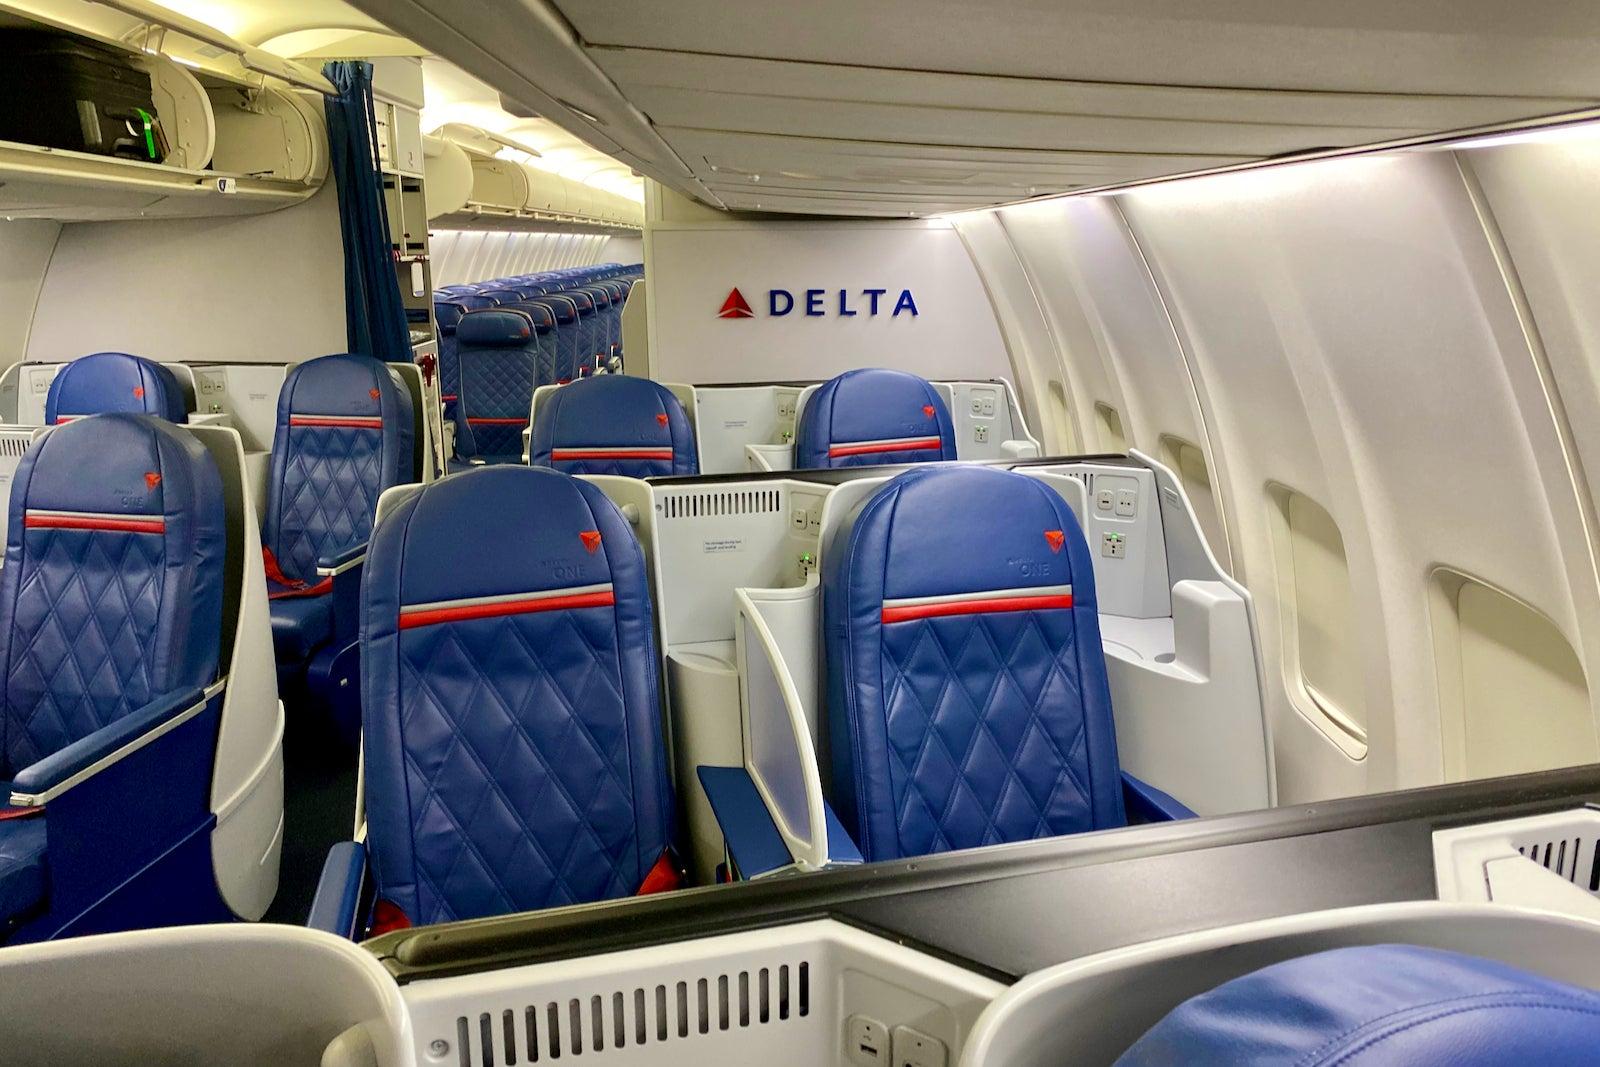 Delta retaliates against American, JetBlue with more lie-flats to LA - The Points Guy